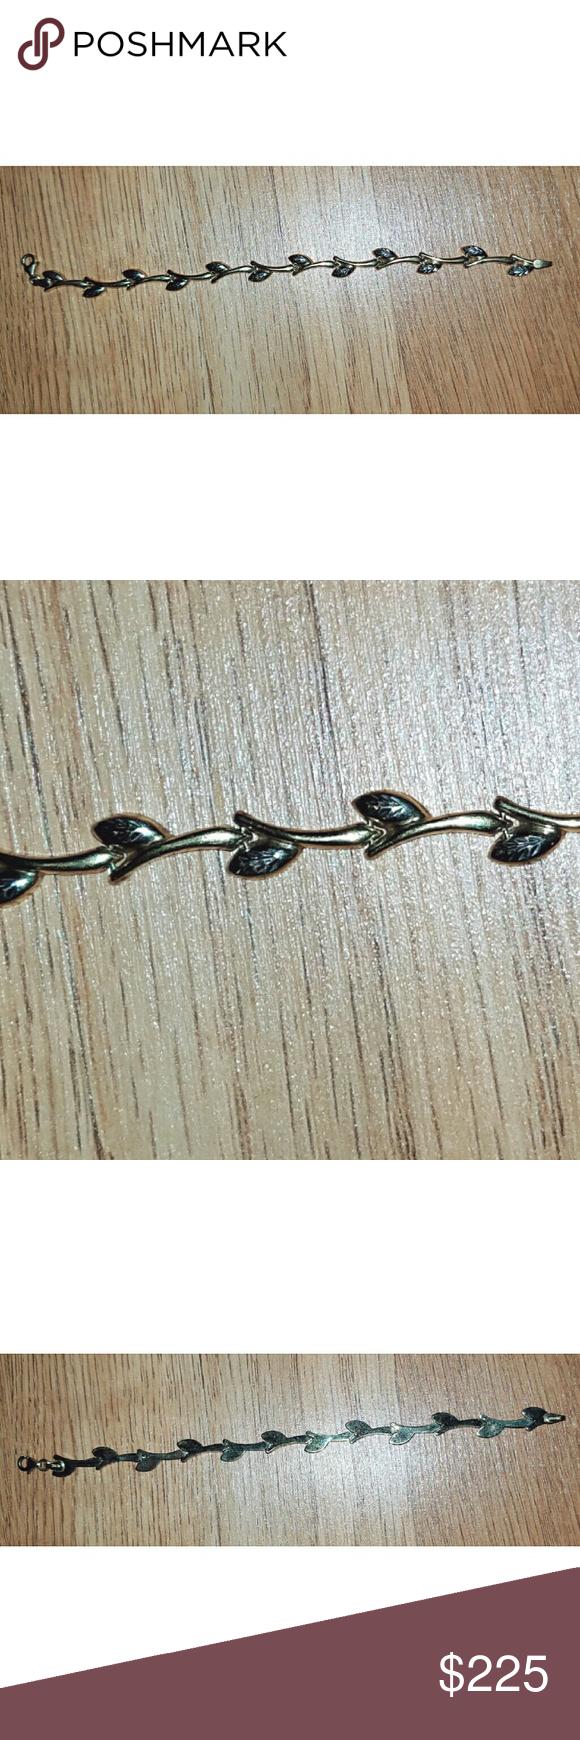 Reduced Price 10k Gold Bracelet 10k Gold Bracelet 10k Bracelet Gold Bracelet